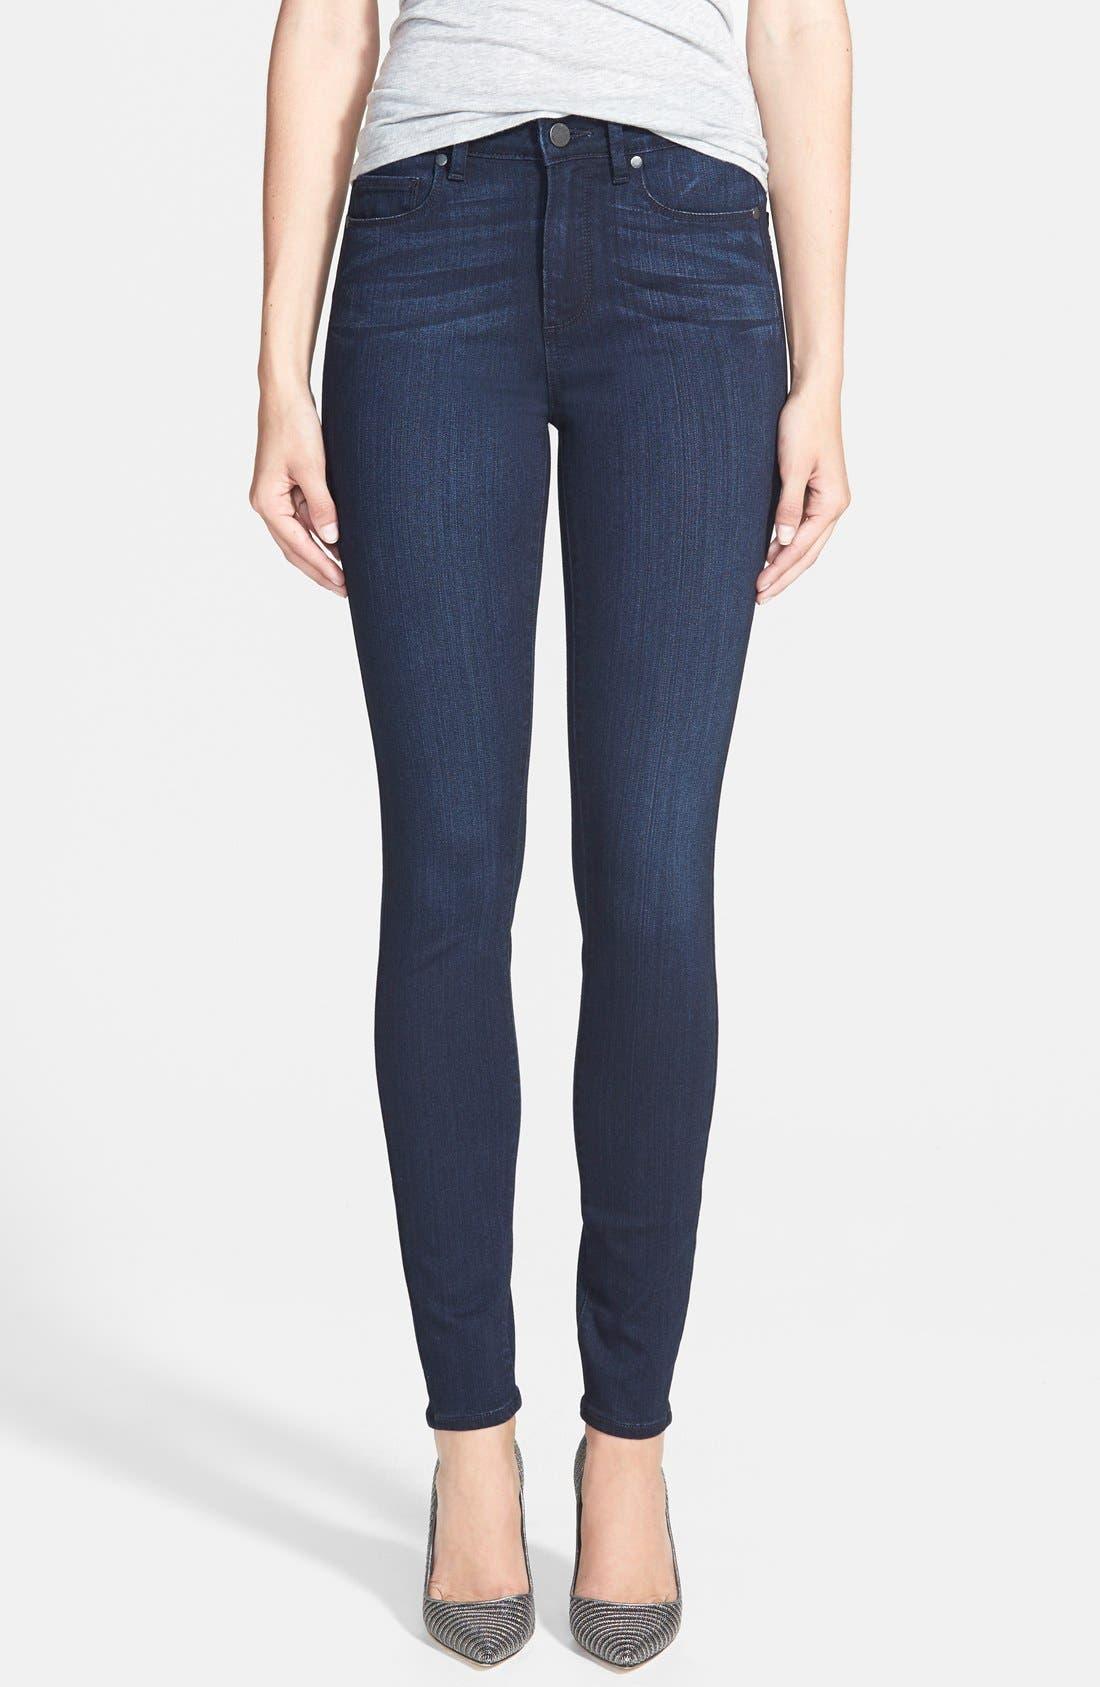 Denim 'Transcend - Hoxton' High Rise Ultra Skinny Jeans,                             Main thumbnail 1, color,                             Mae